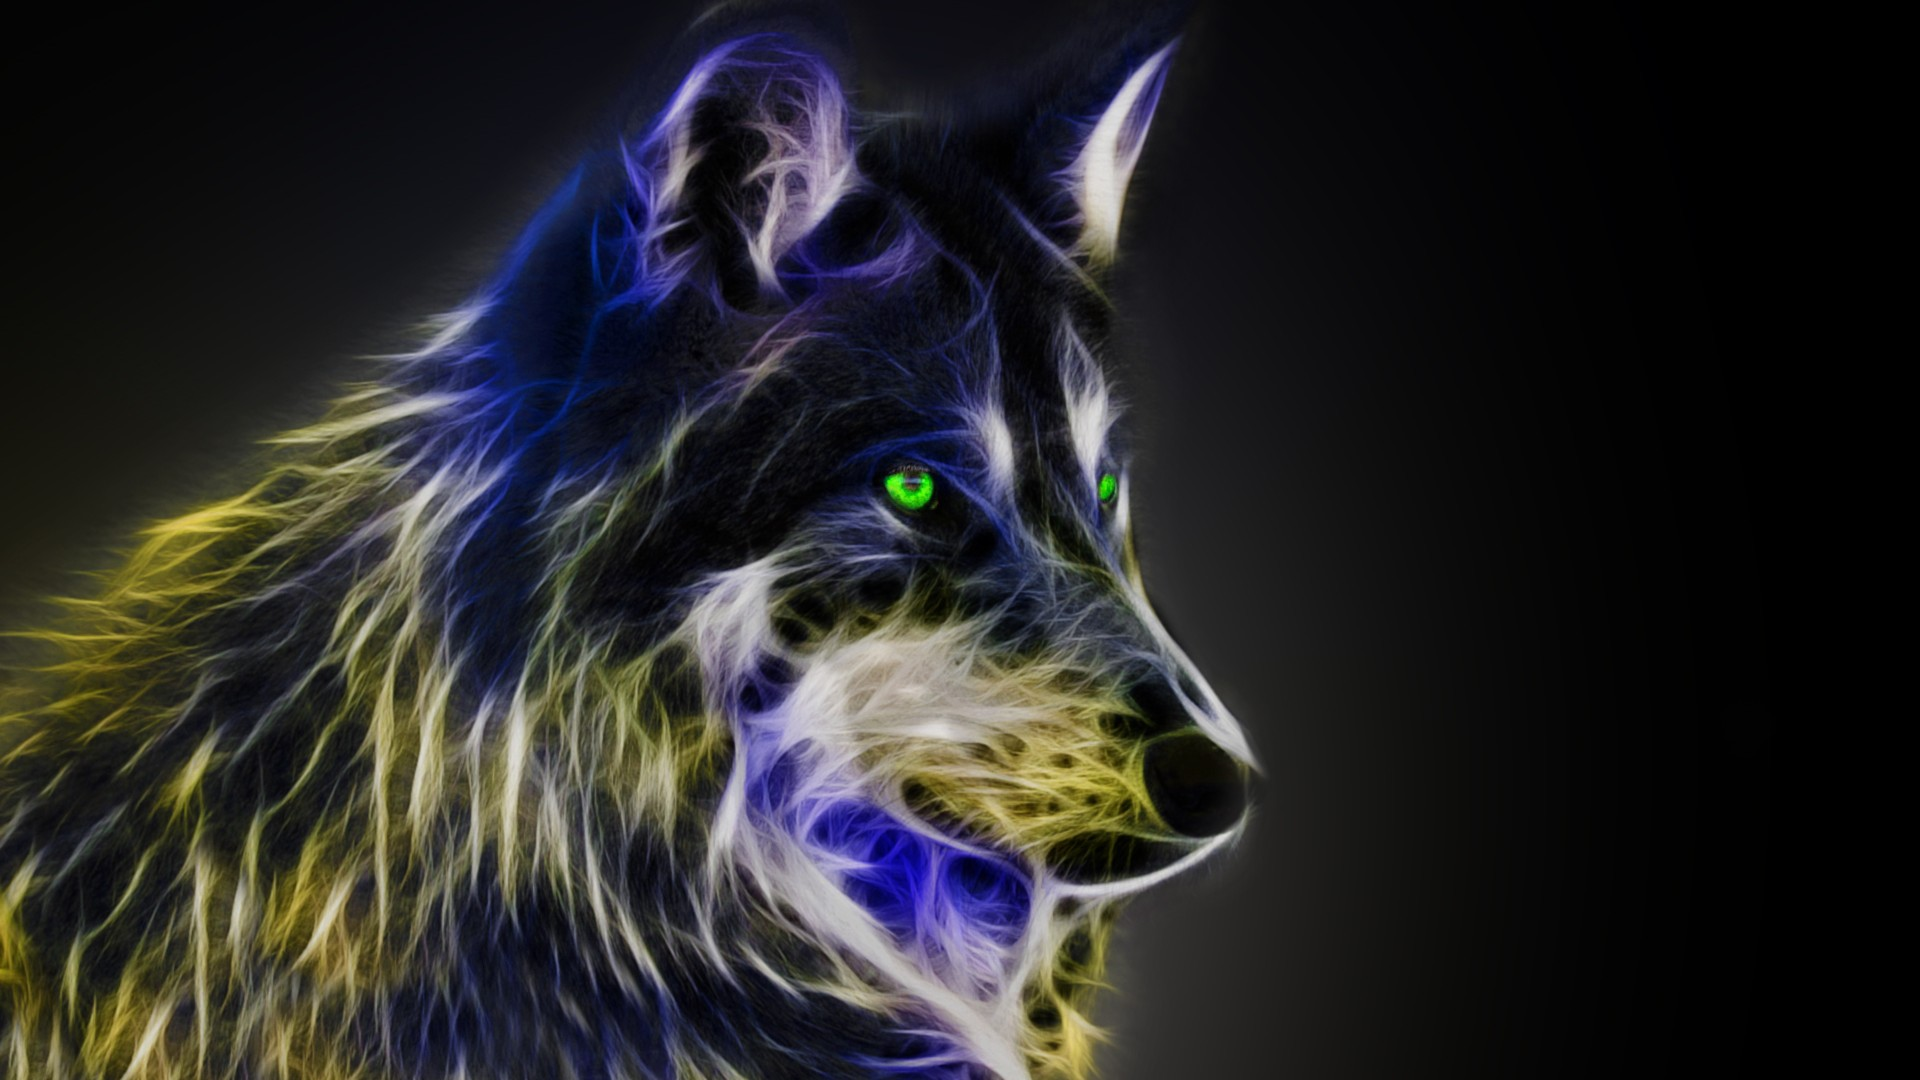 Cool Wolf Desktop Backgrounds HD 2021 Cute Wallpapers 1920x1080